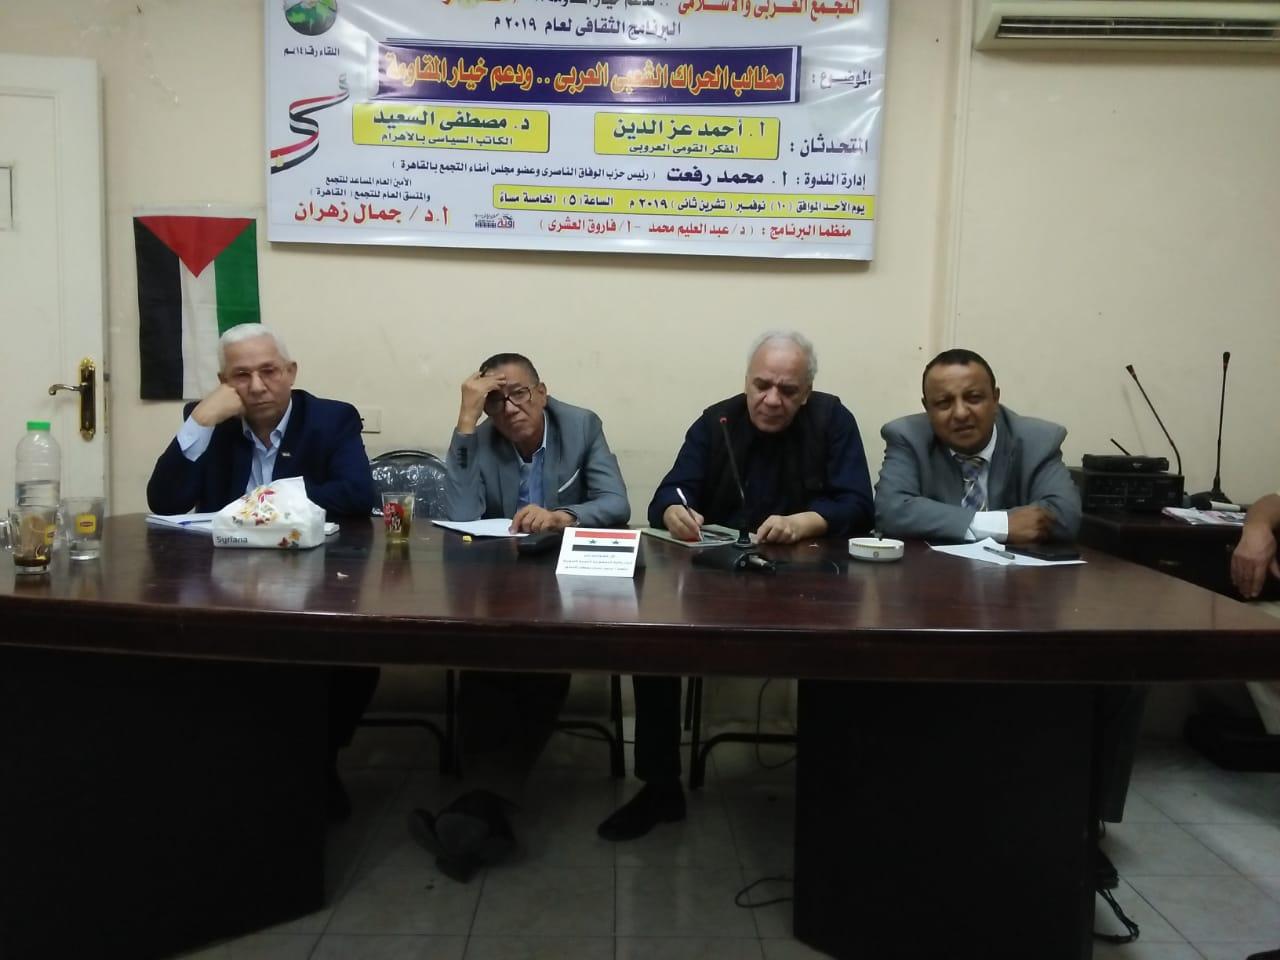 "<a class=""amazingslider-posttitle-link"" href=""https://www.alhoukoul.com/ndwtt-fe-alqahrtt-alhrak-alshabe-alarbe-wdam-khear-almqawmtt/"">ندوة في القاهرة : ""الحراك الشعبي العربي ودعم خيار المقاومة""</a>"